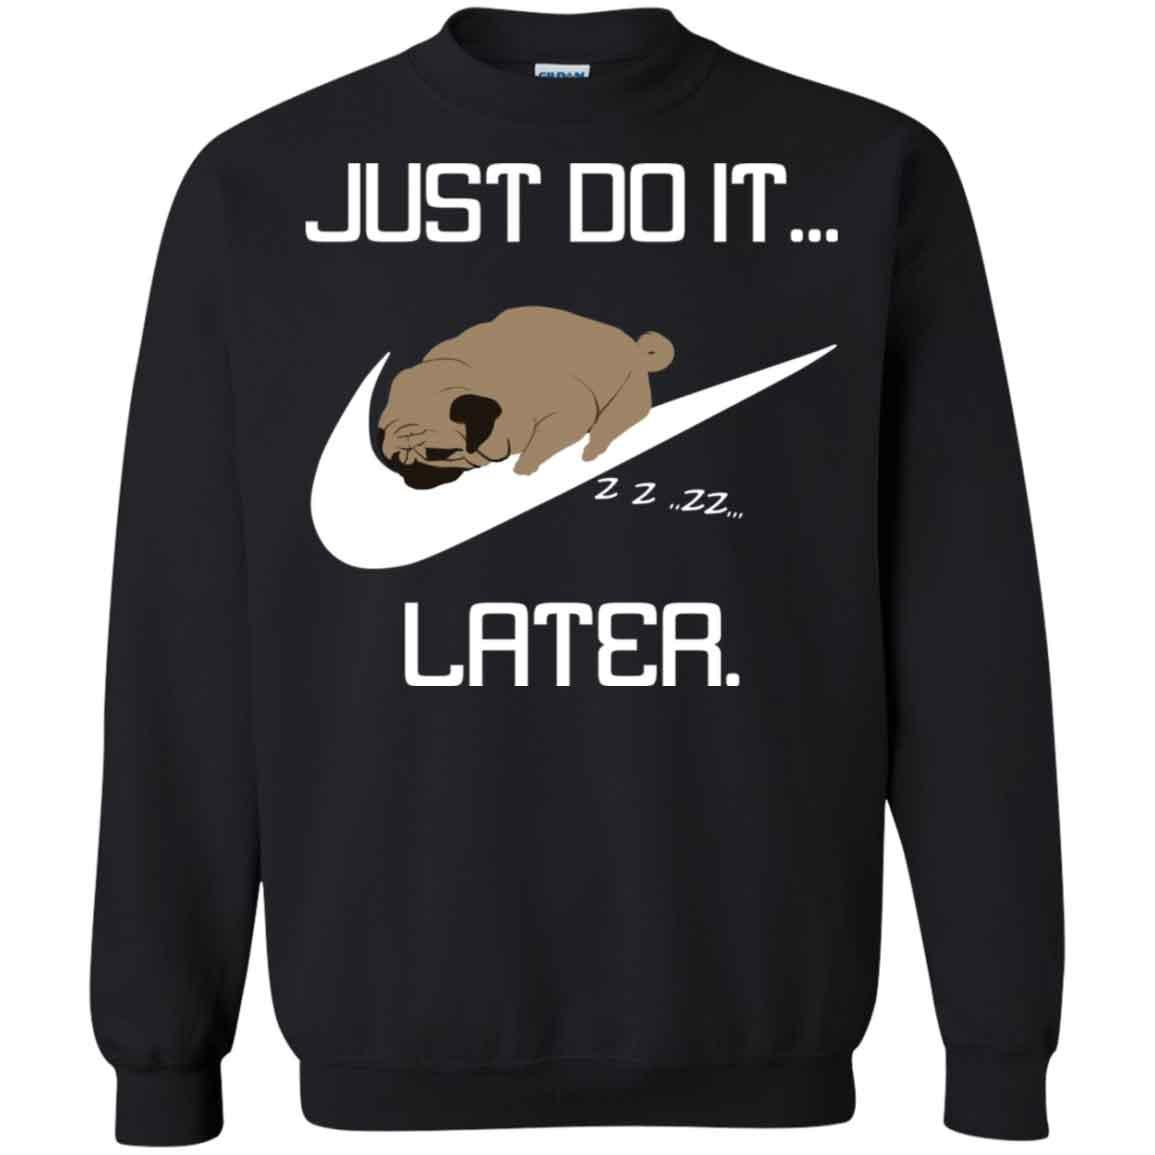 9b4a384d Pug Nike Just Do It Later Hoodies Sweatshirts – TeeTrio